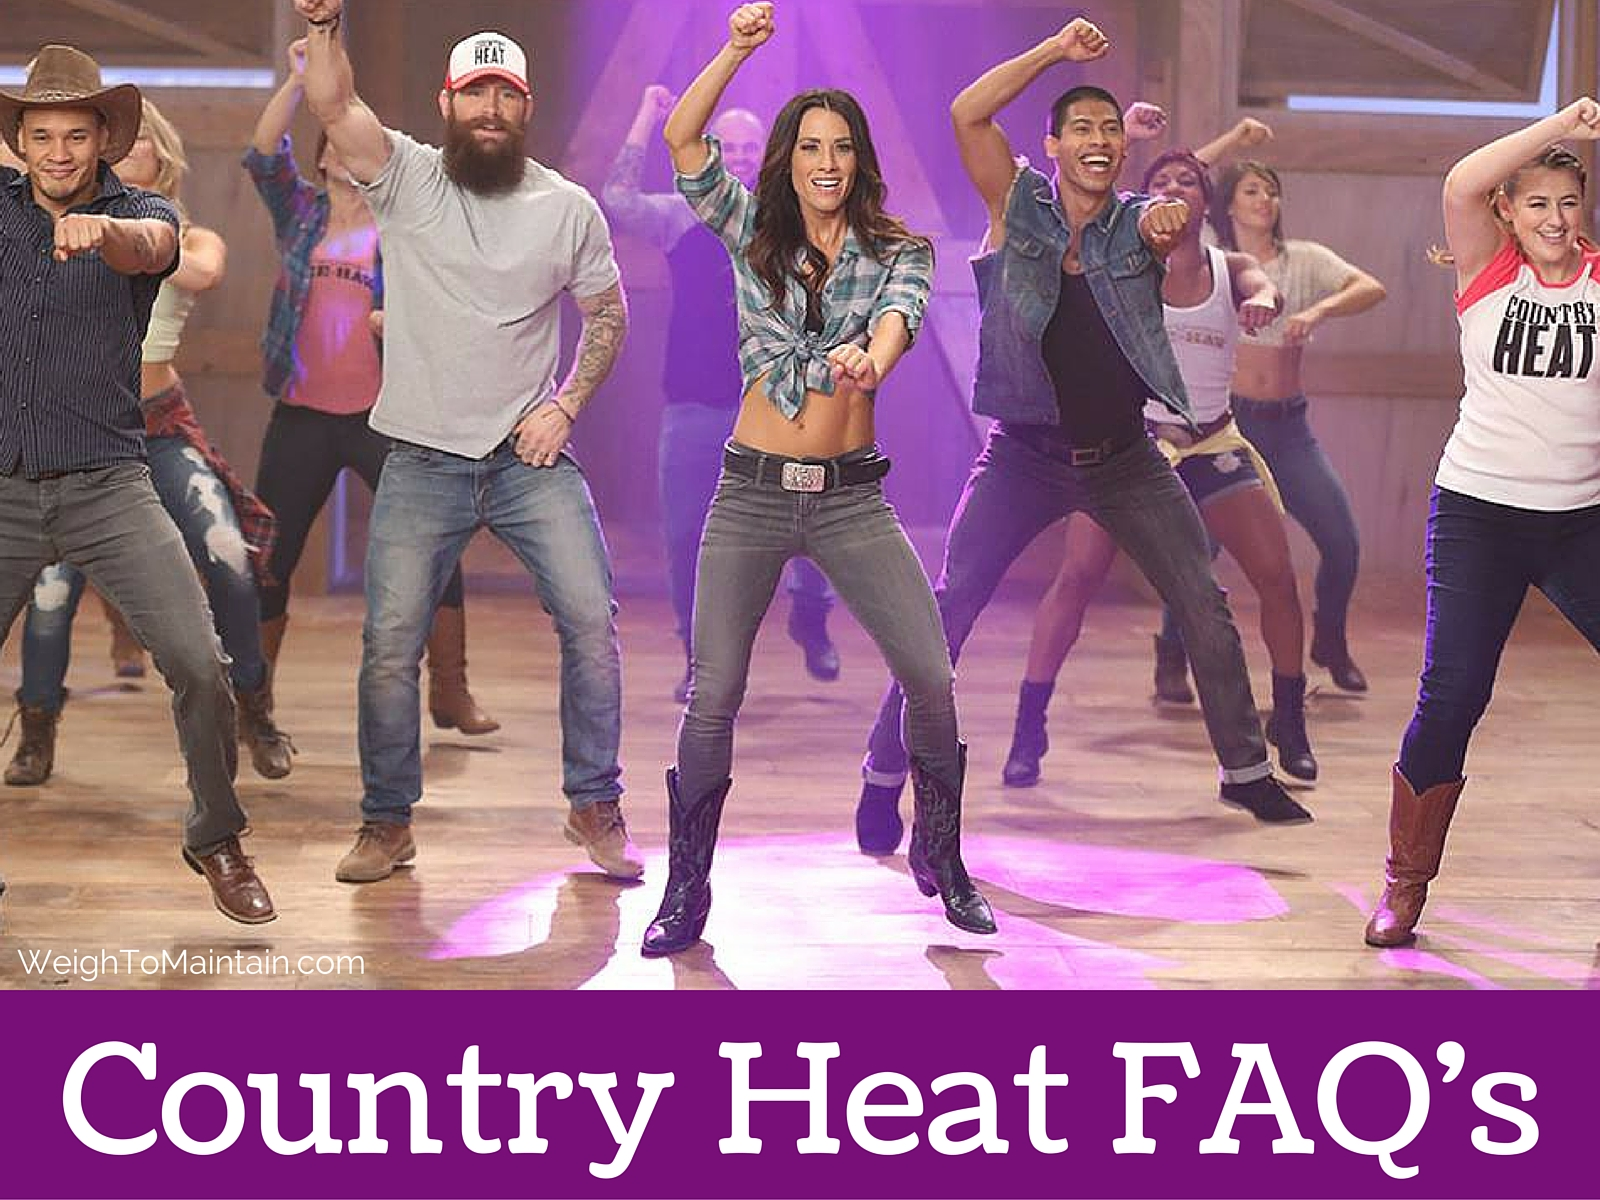 country-heat-faq-featured-image.jpg